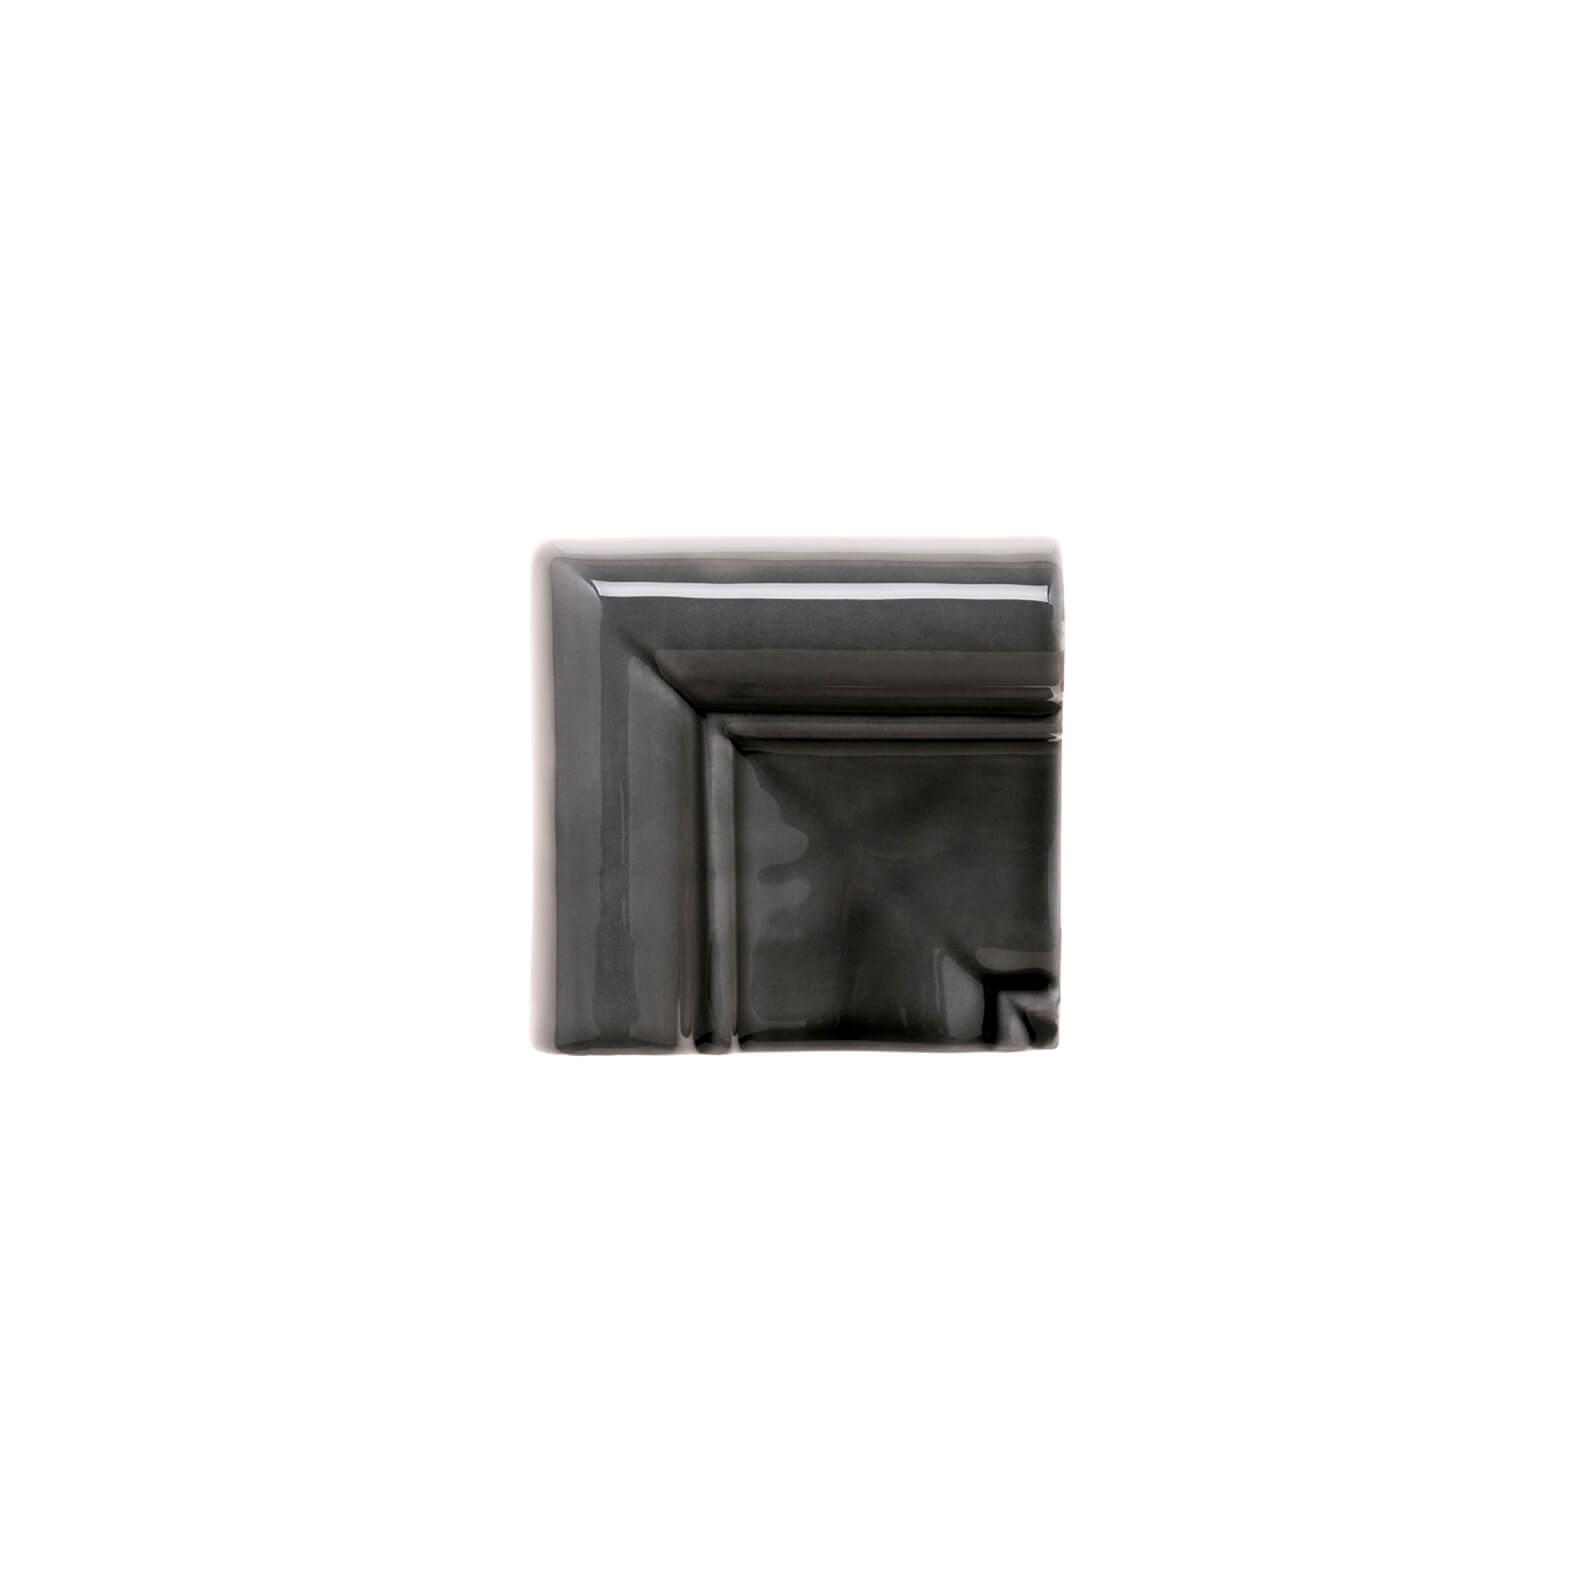 ADST5169 - ANGULO MARCO CORNISA - 7.5 cm X 19.8 cm